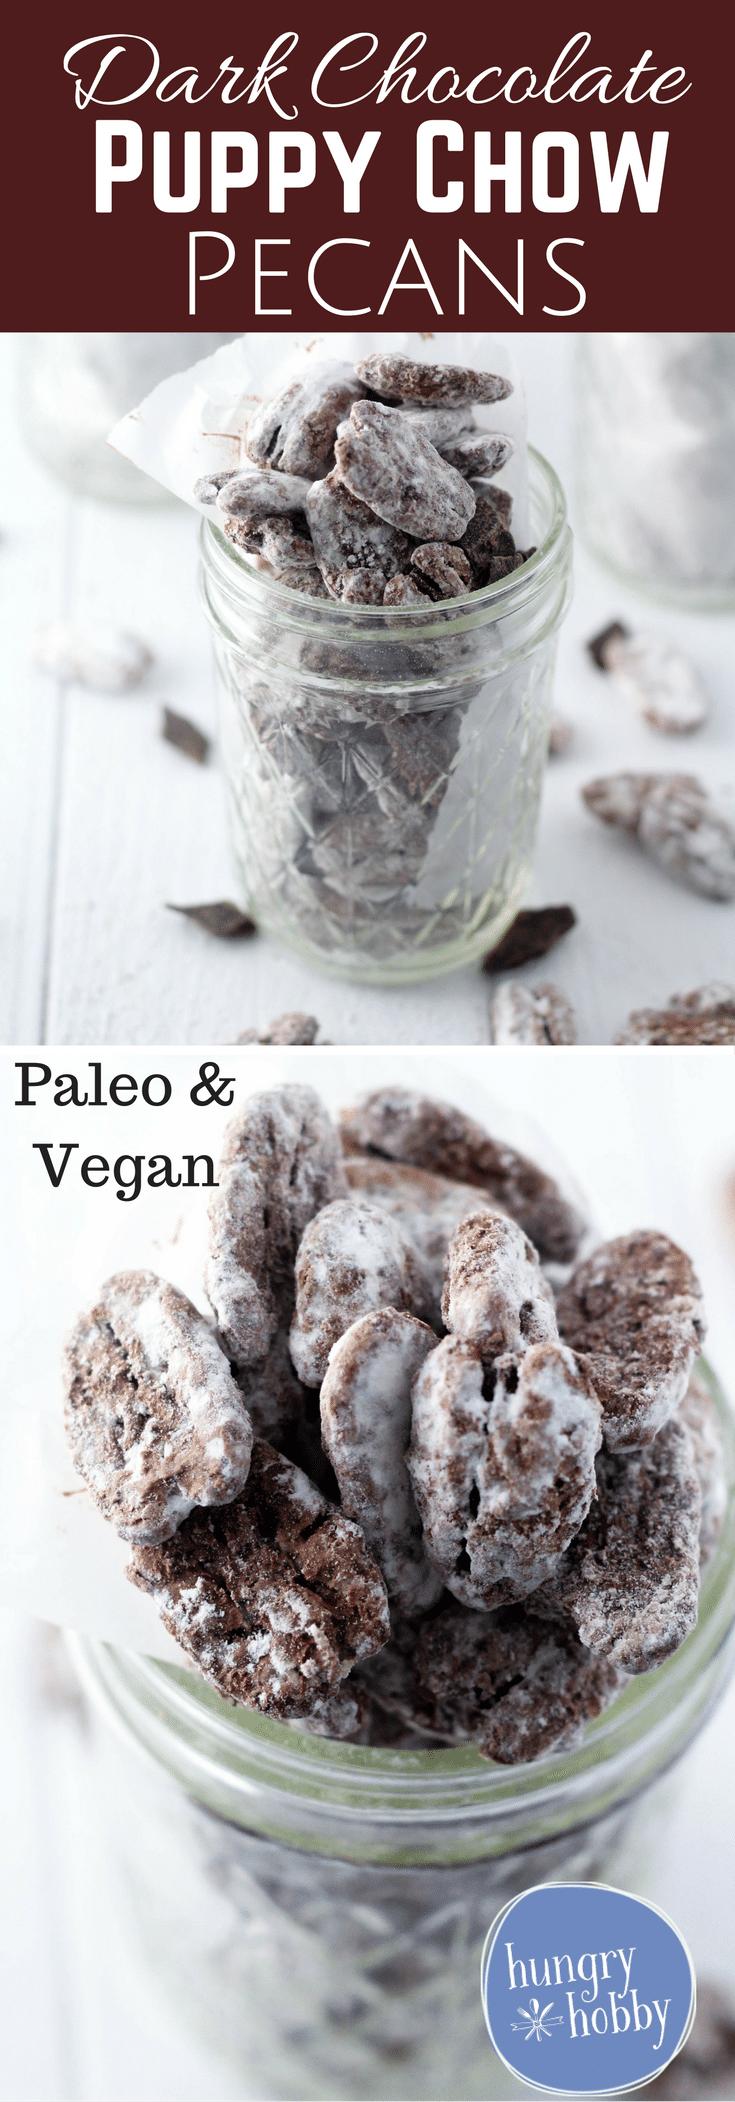 Dark Chocolate Puppy Chow Pecans (Vegan and Paleo Friendly)